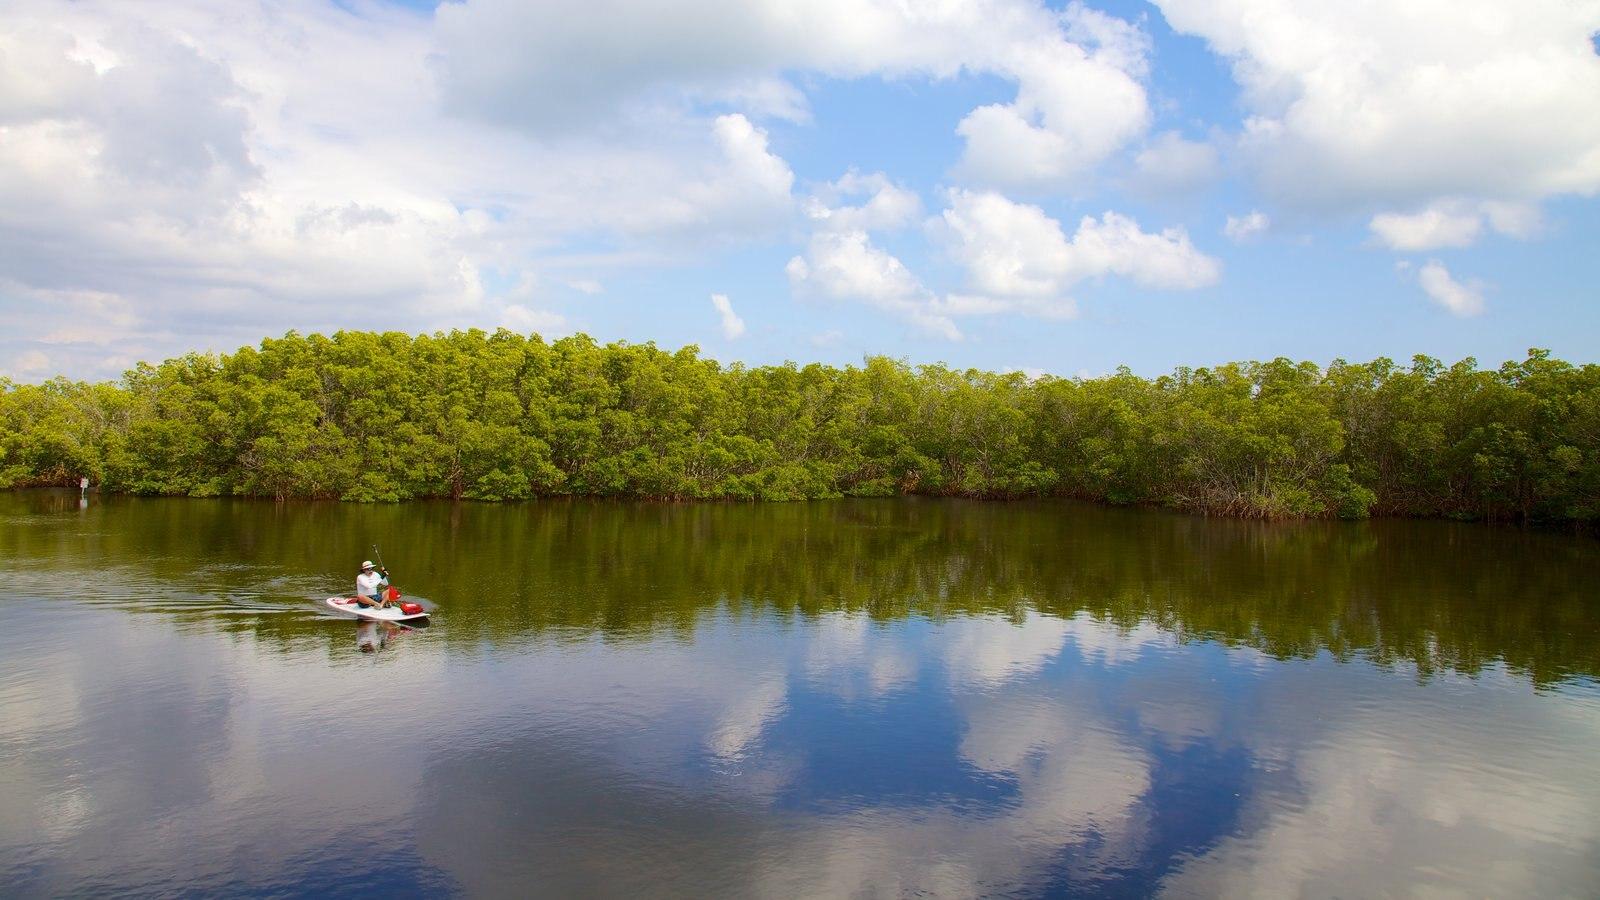 Weedon Island Preserve showing kayaking or canoeing, island views and a lake or waterhole